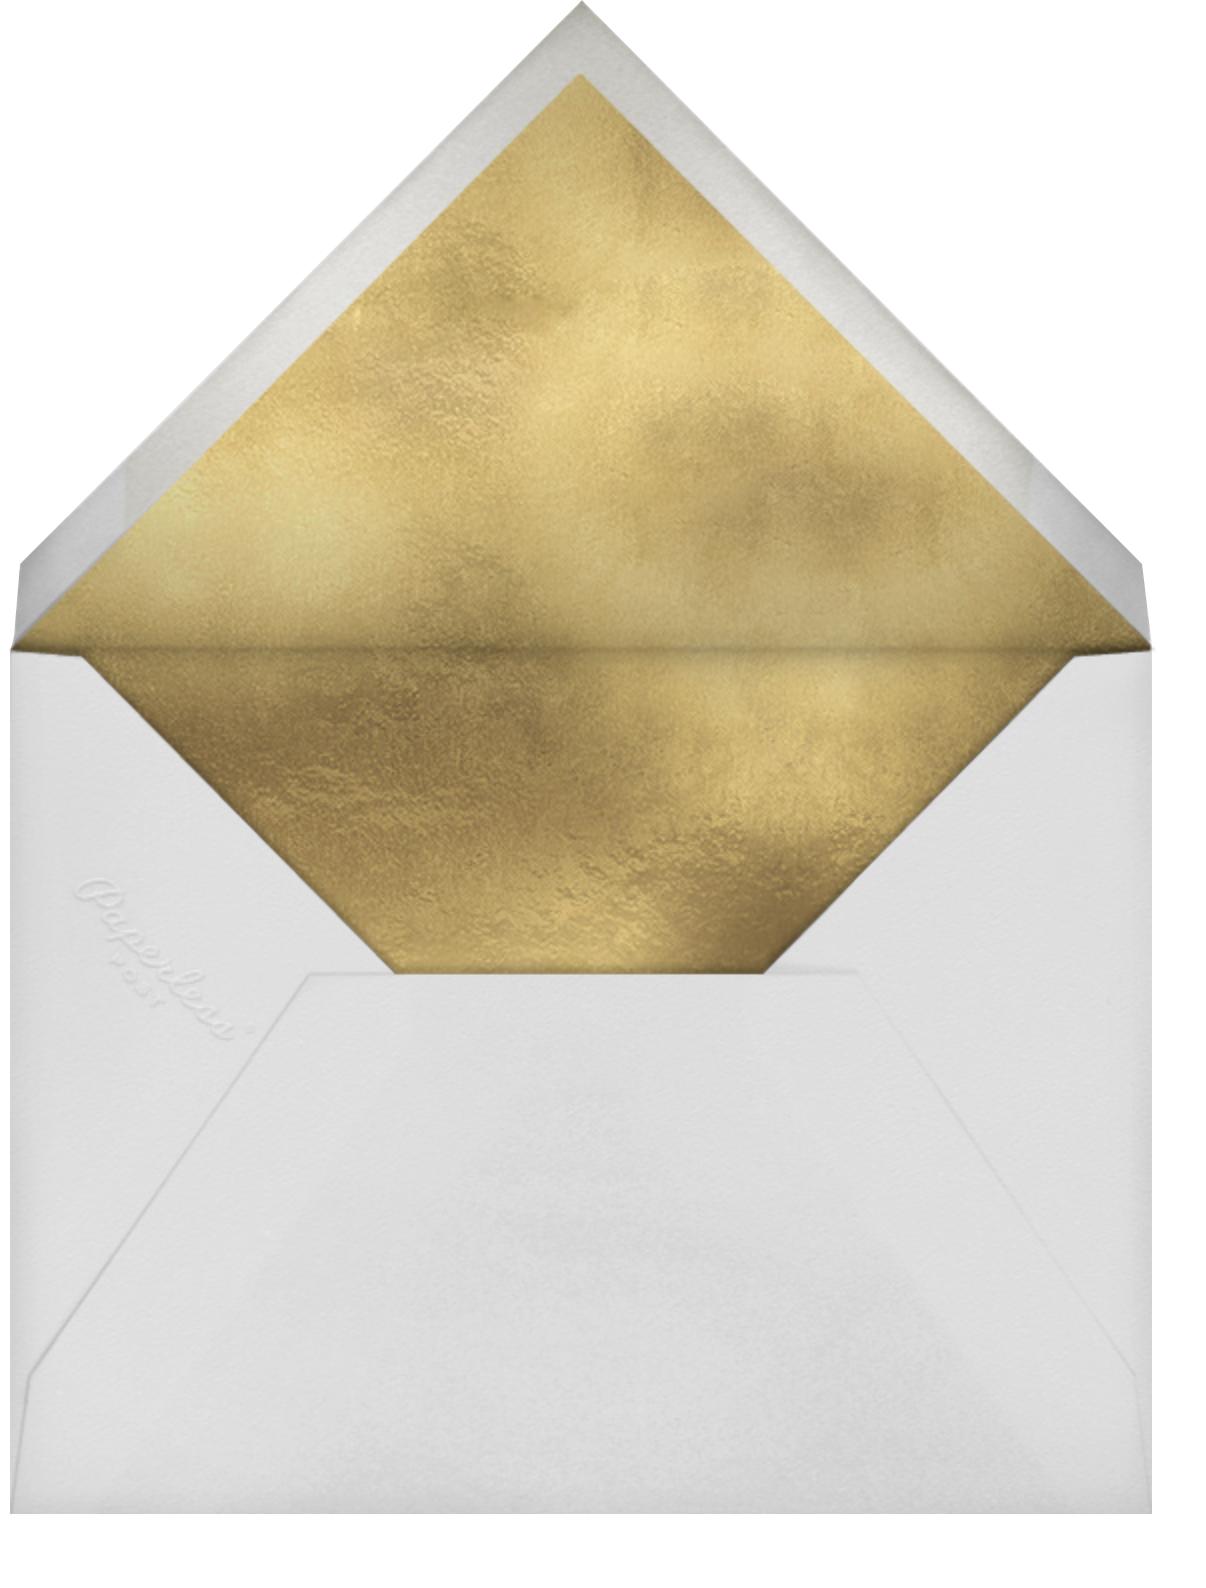 Avalon - Macaron - Kelly Wearstler - Christmas party - envelope back